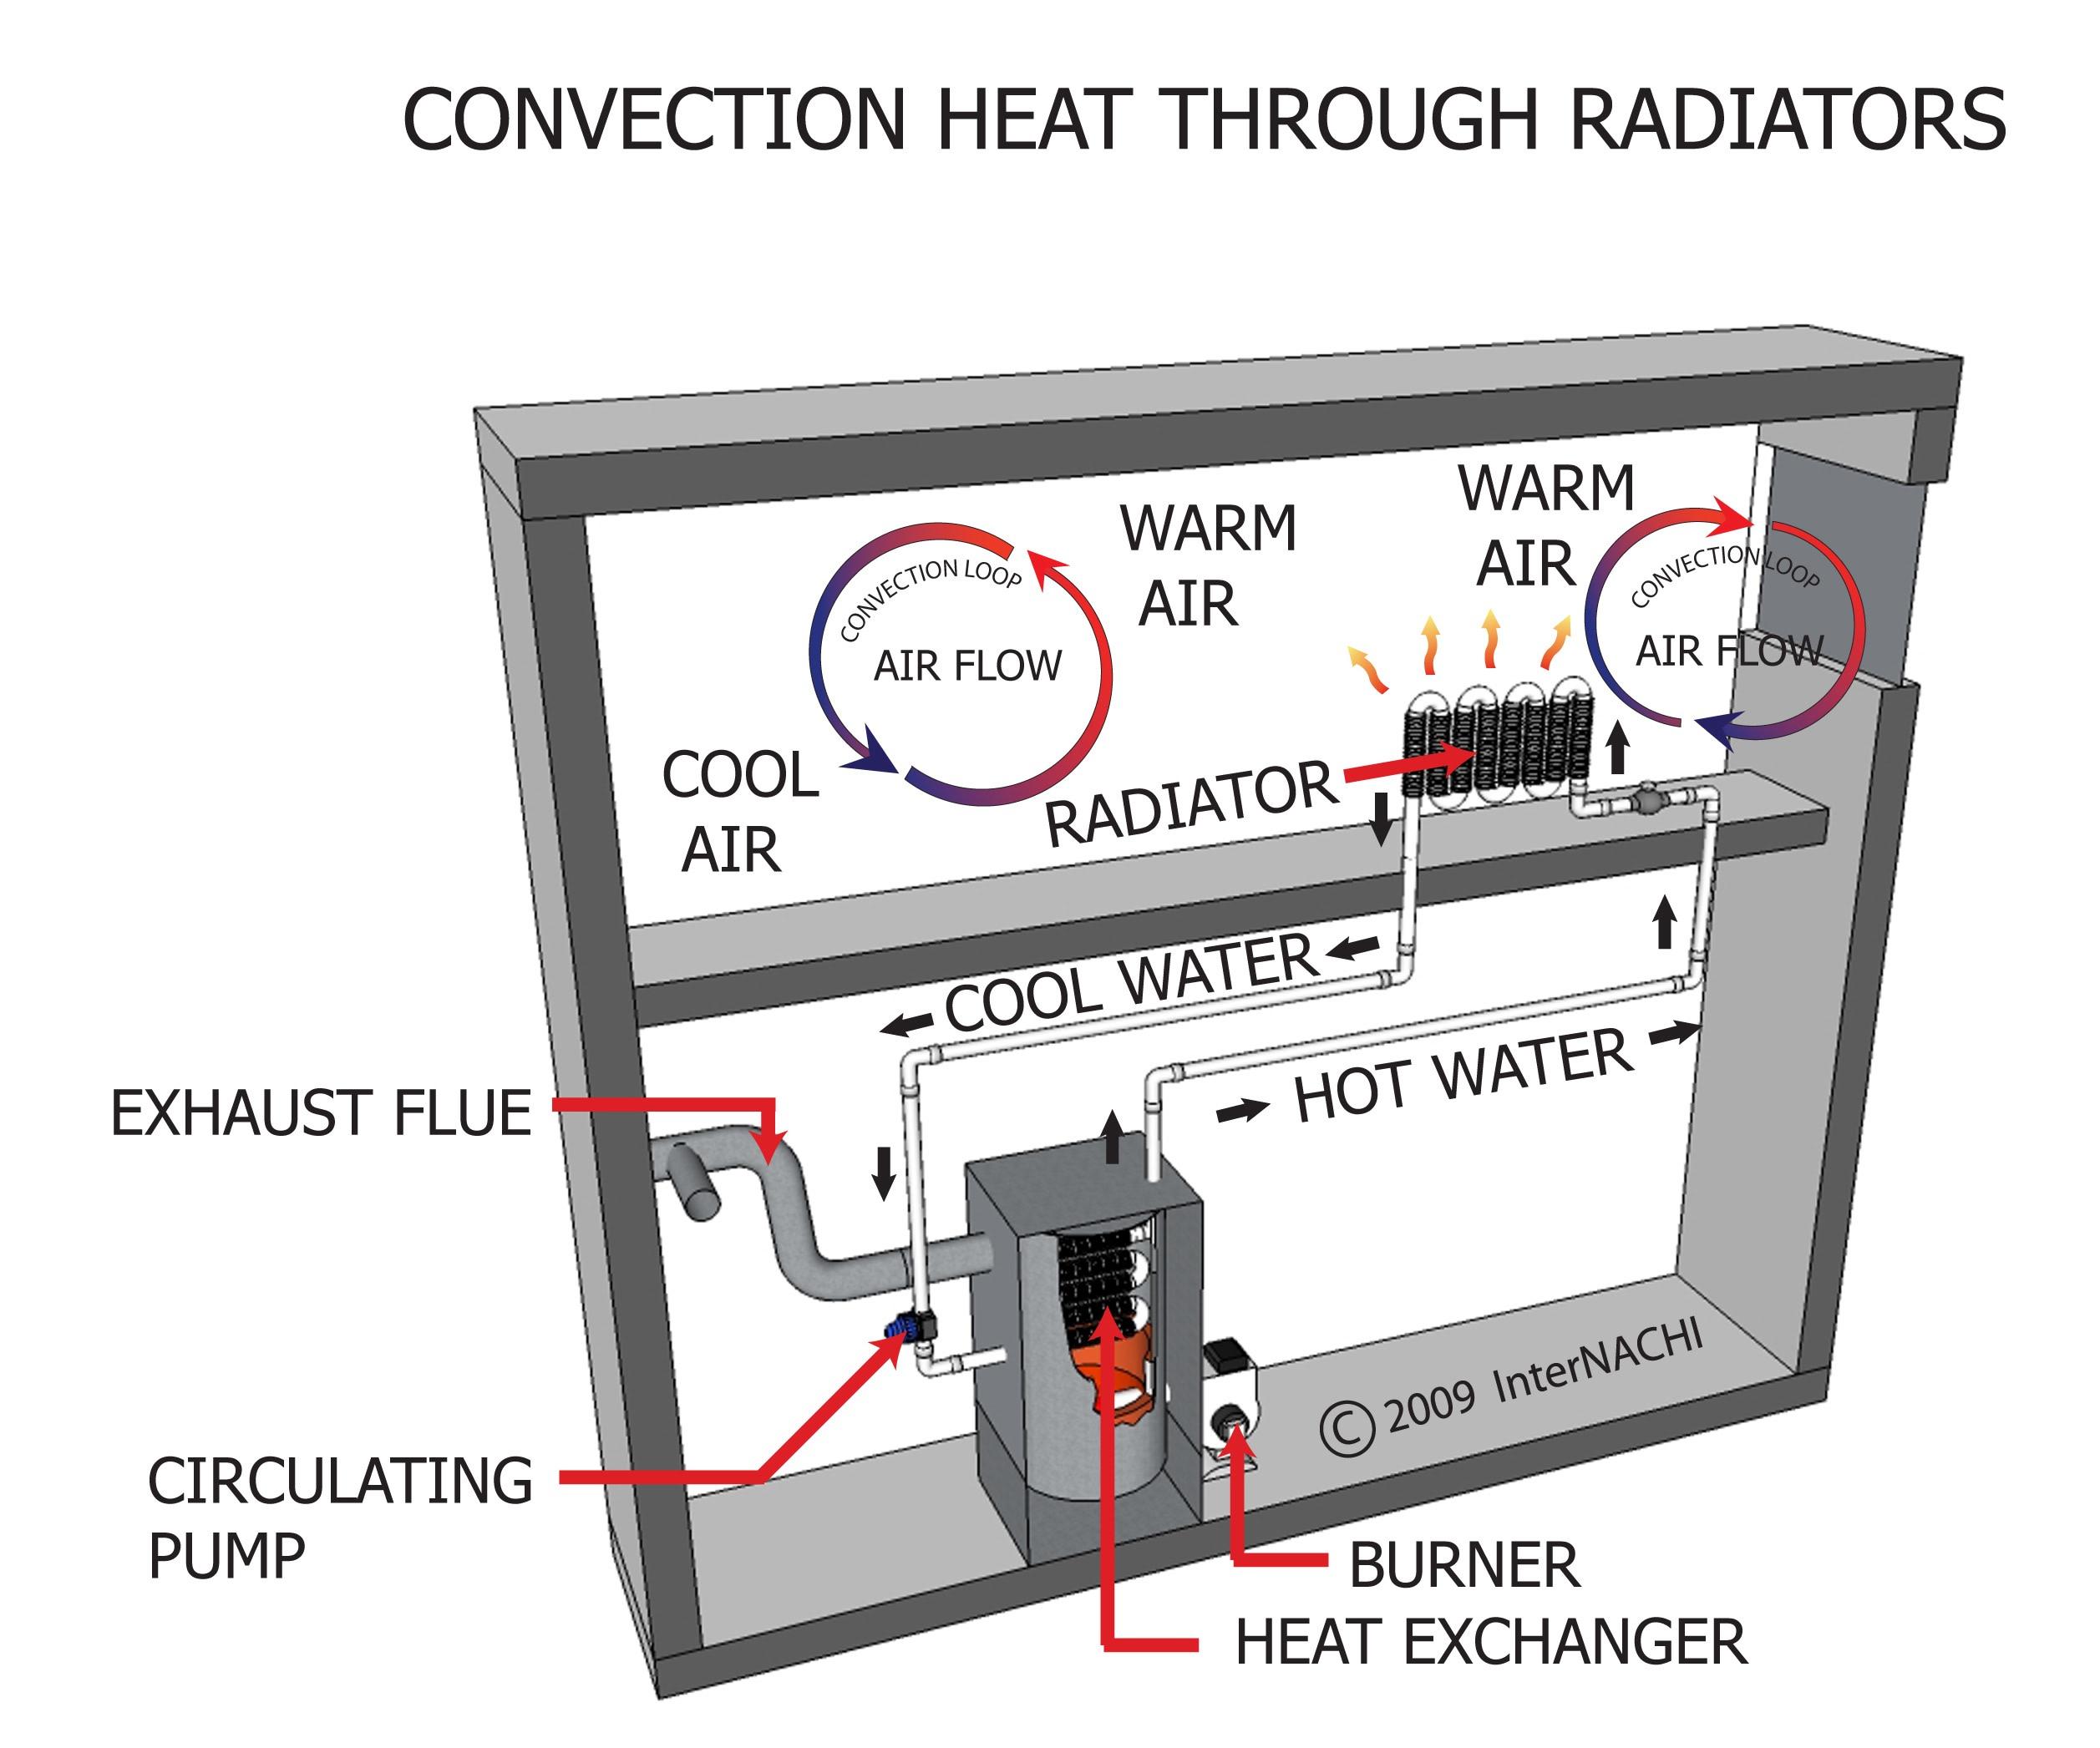 Convection heat-through radiators.